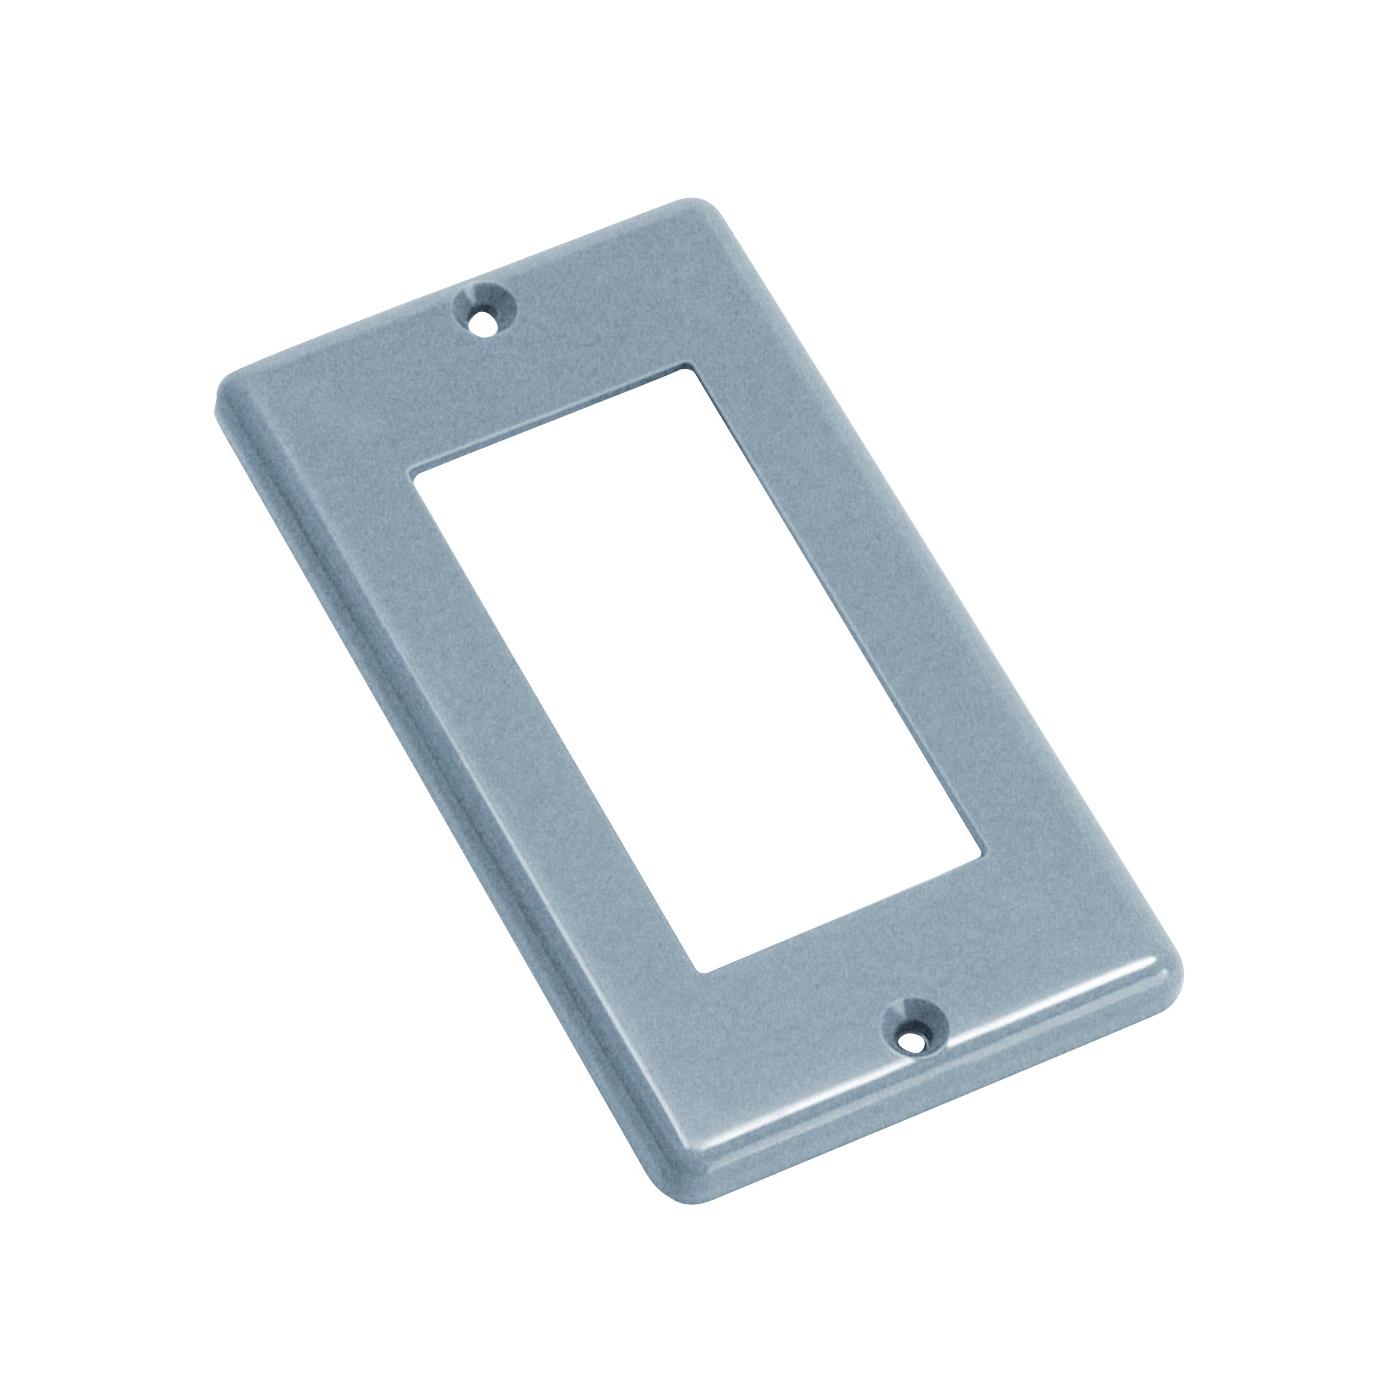 Picture of Carlon HB1GF Handy Box Cover, 4-5/16 in L, 2-3/8 in W, Polycarbonate, Gray